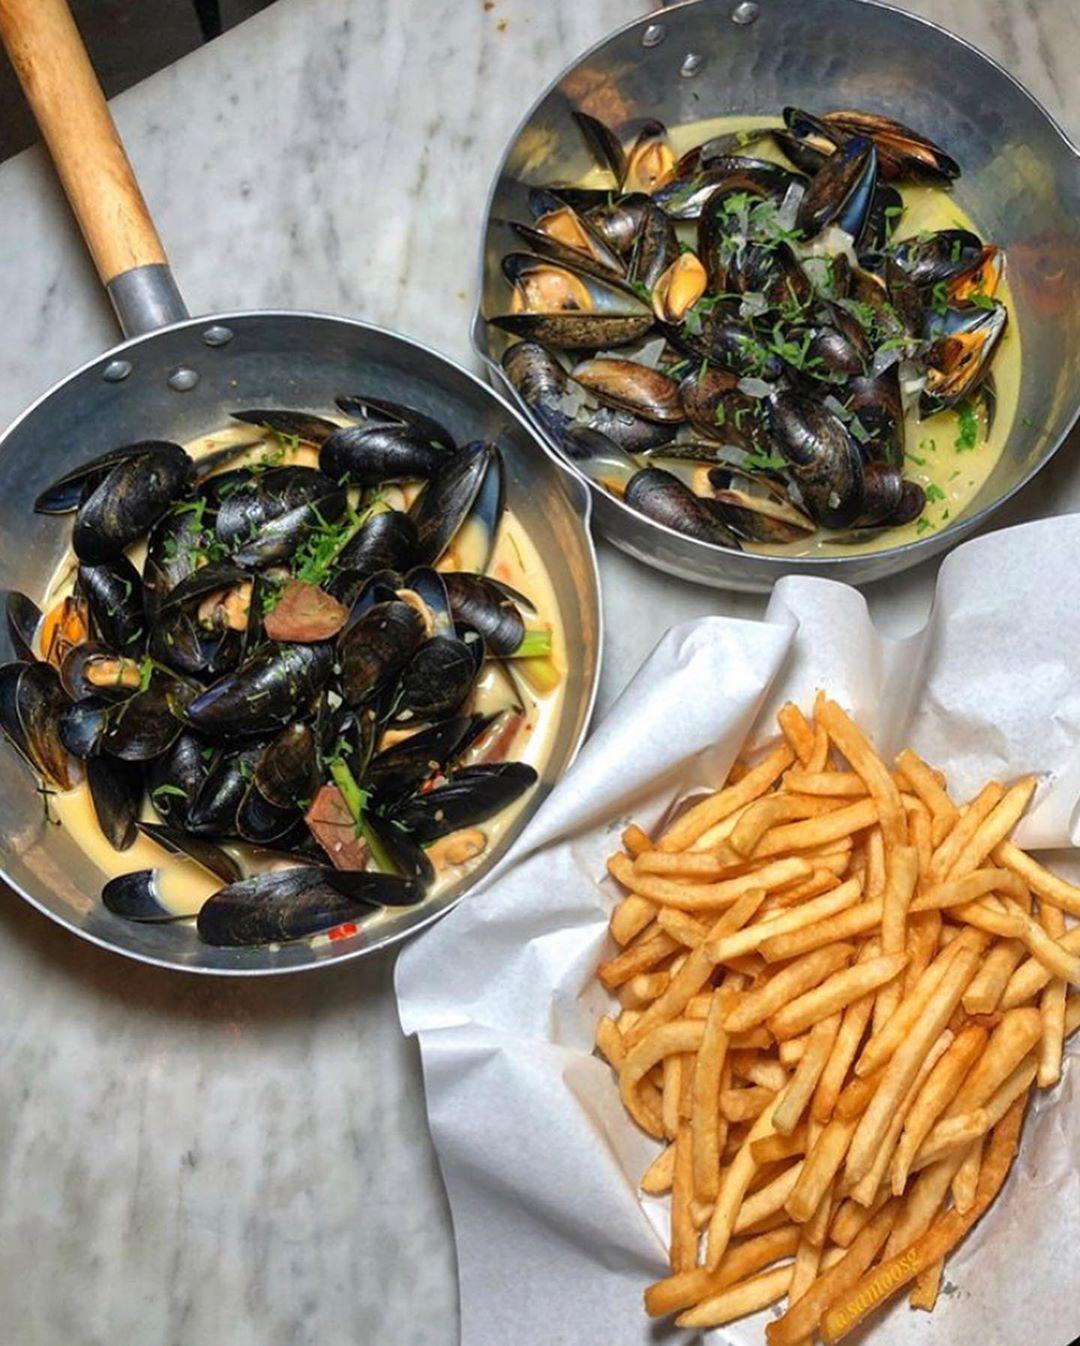 restaurant food delivery singapore - BTM Mussels & Bar